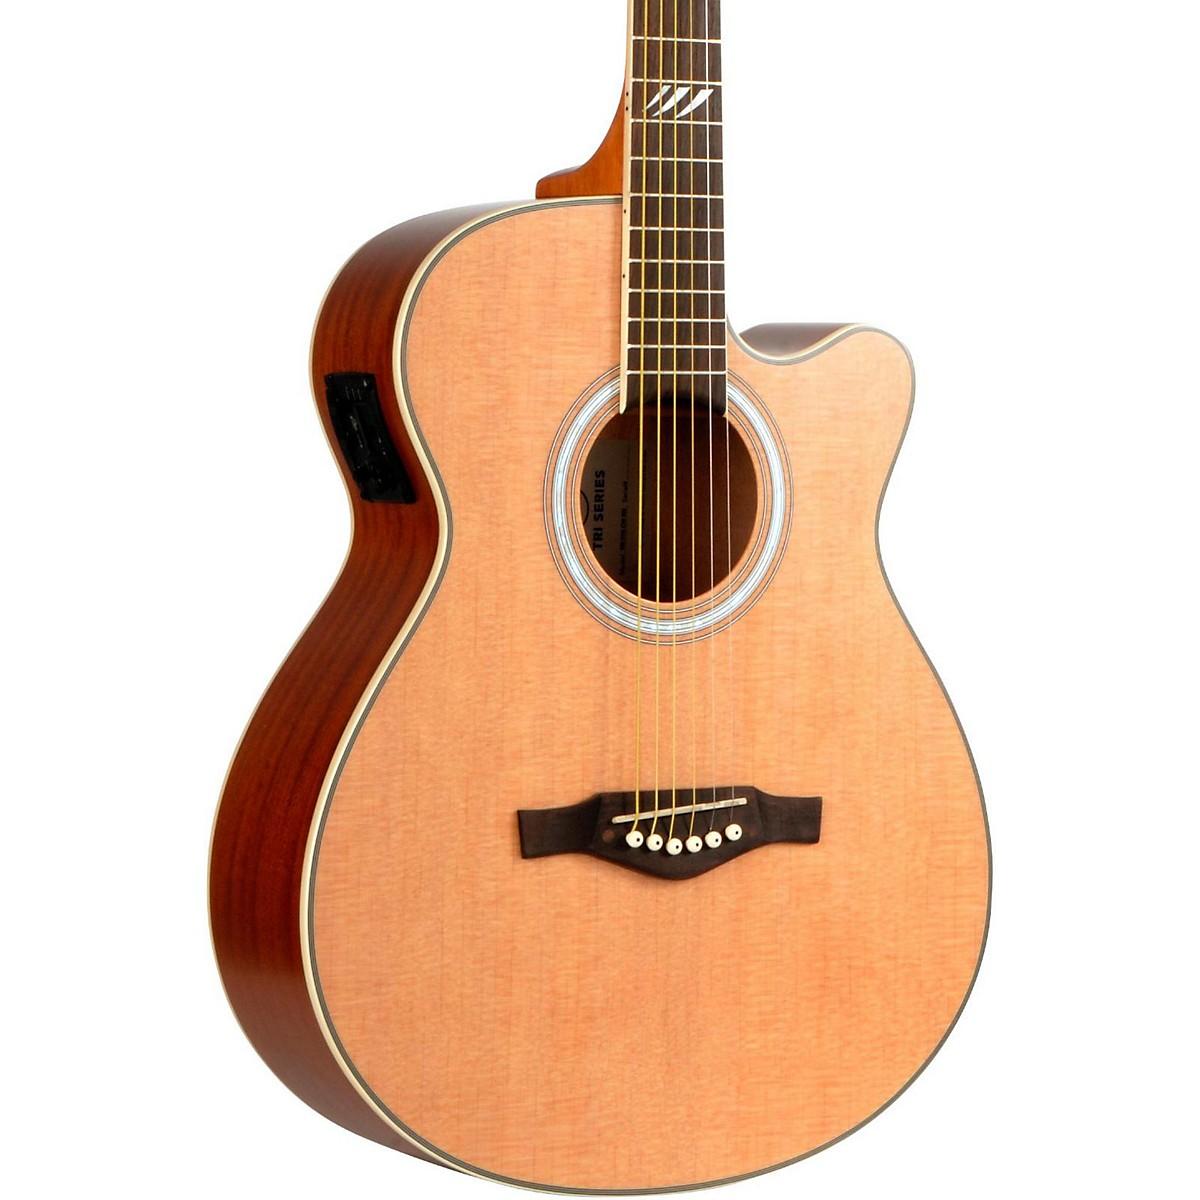 EKO TRI Series Auditorium Cutaway Acoustic-Electric Guitar